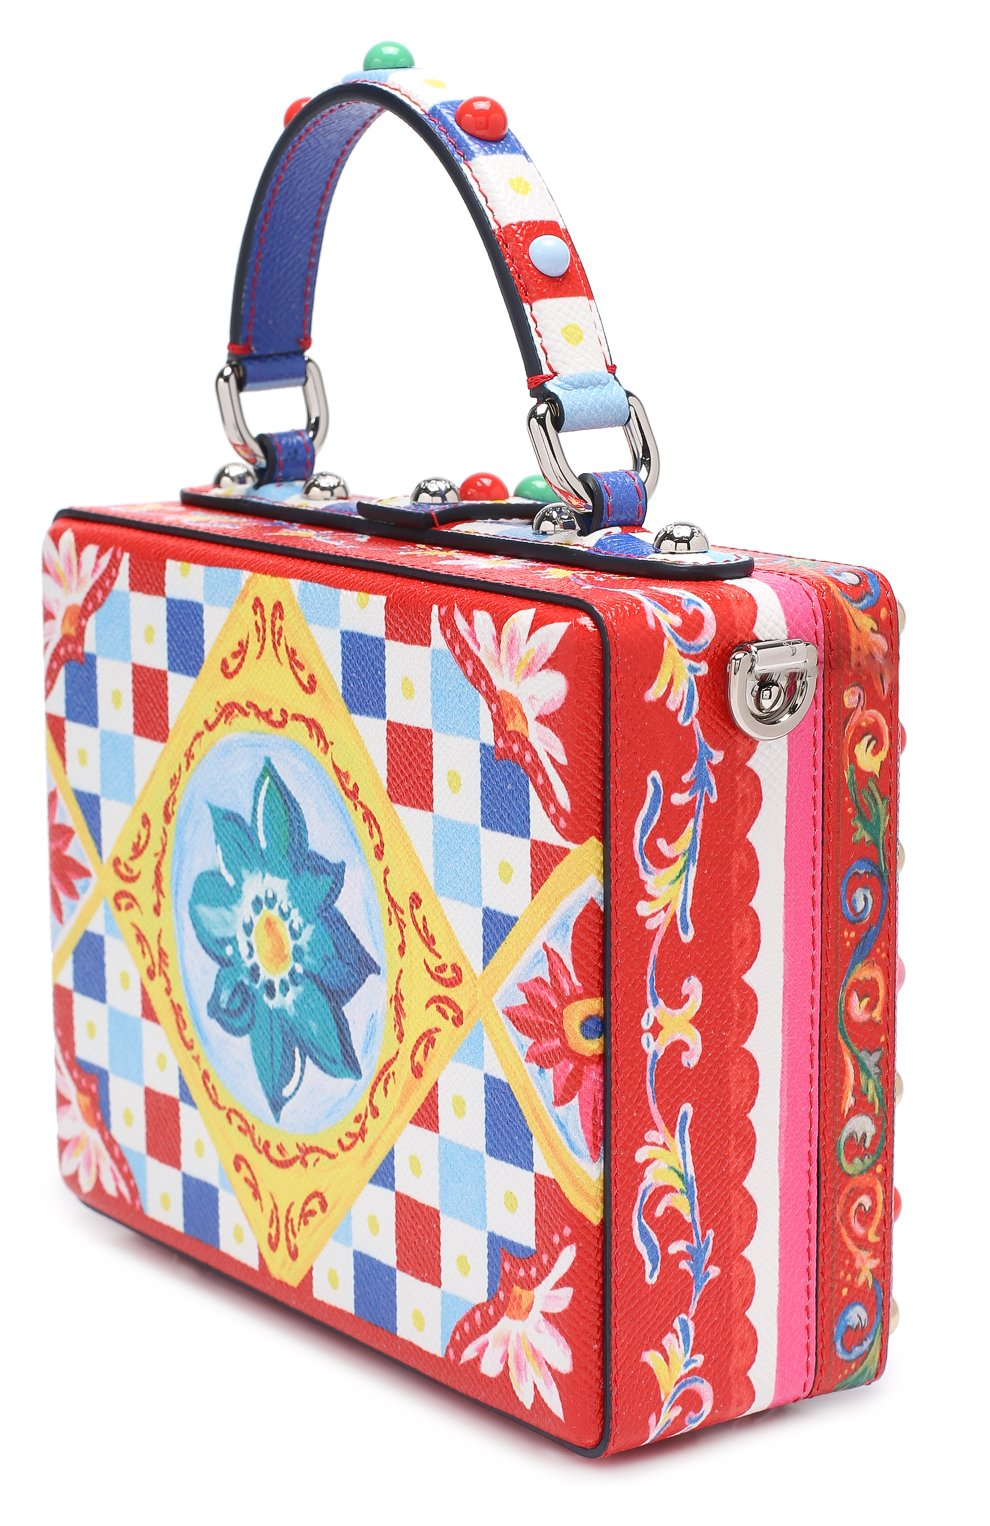 Сумка Dolce Box с декоративной отделкой | Фото №3